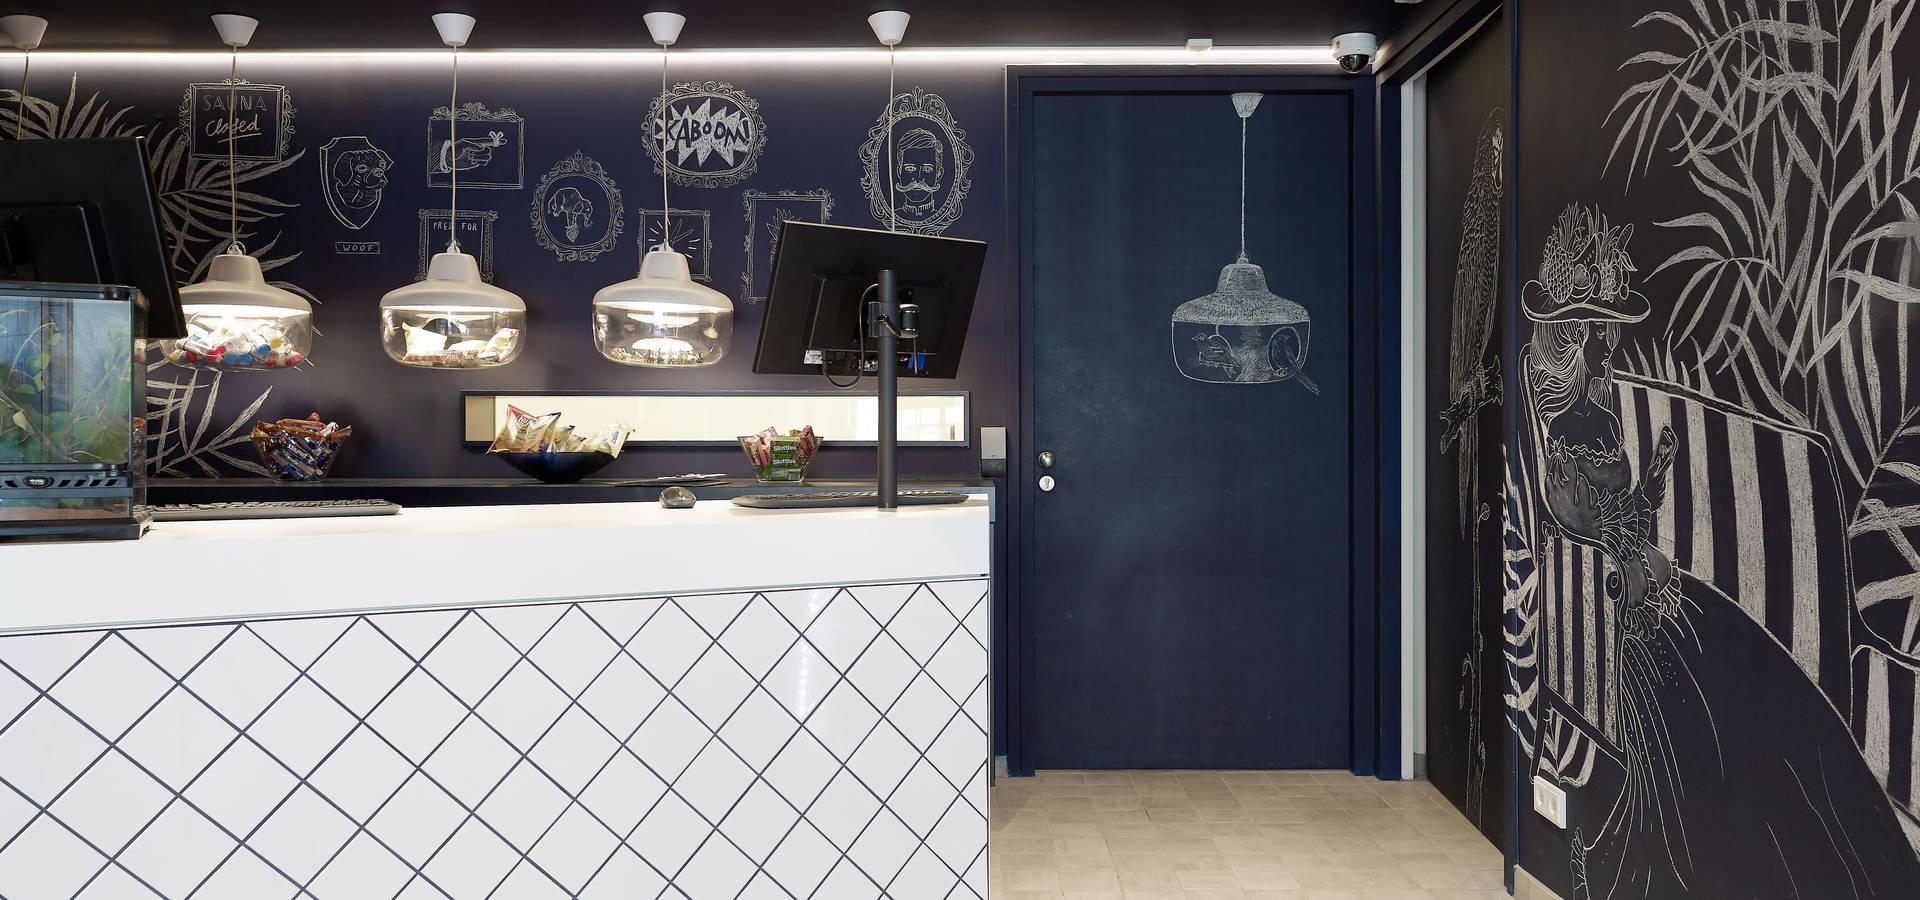 INTER/ALTER interior architects